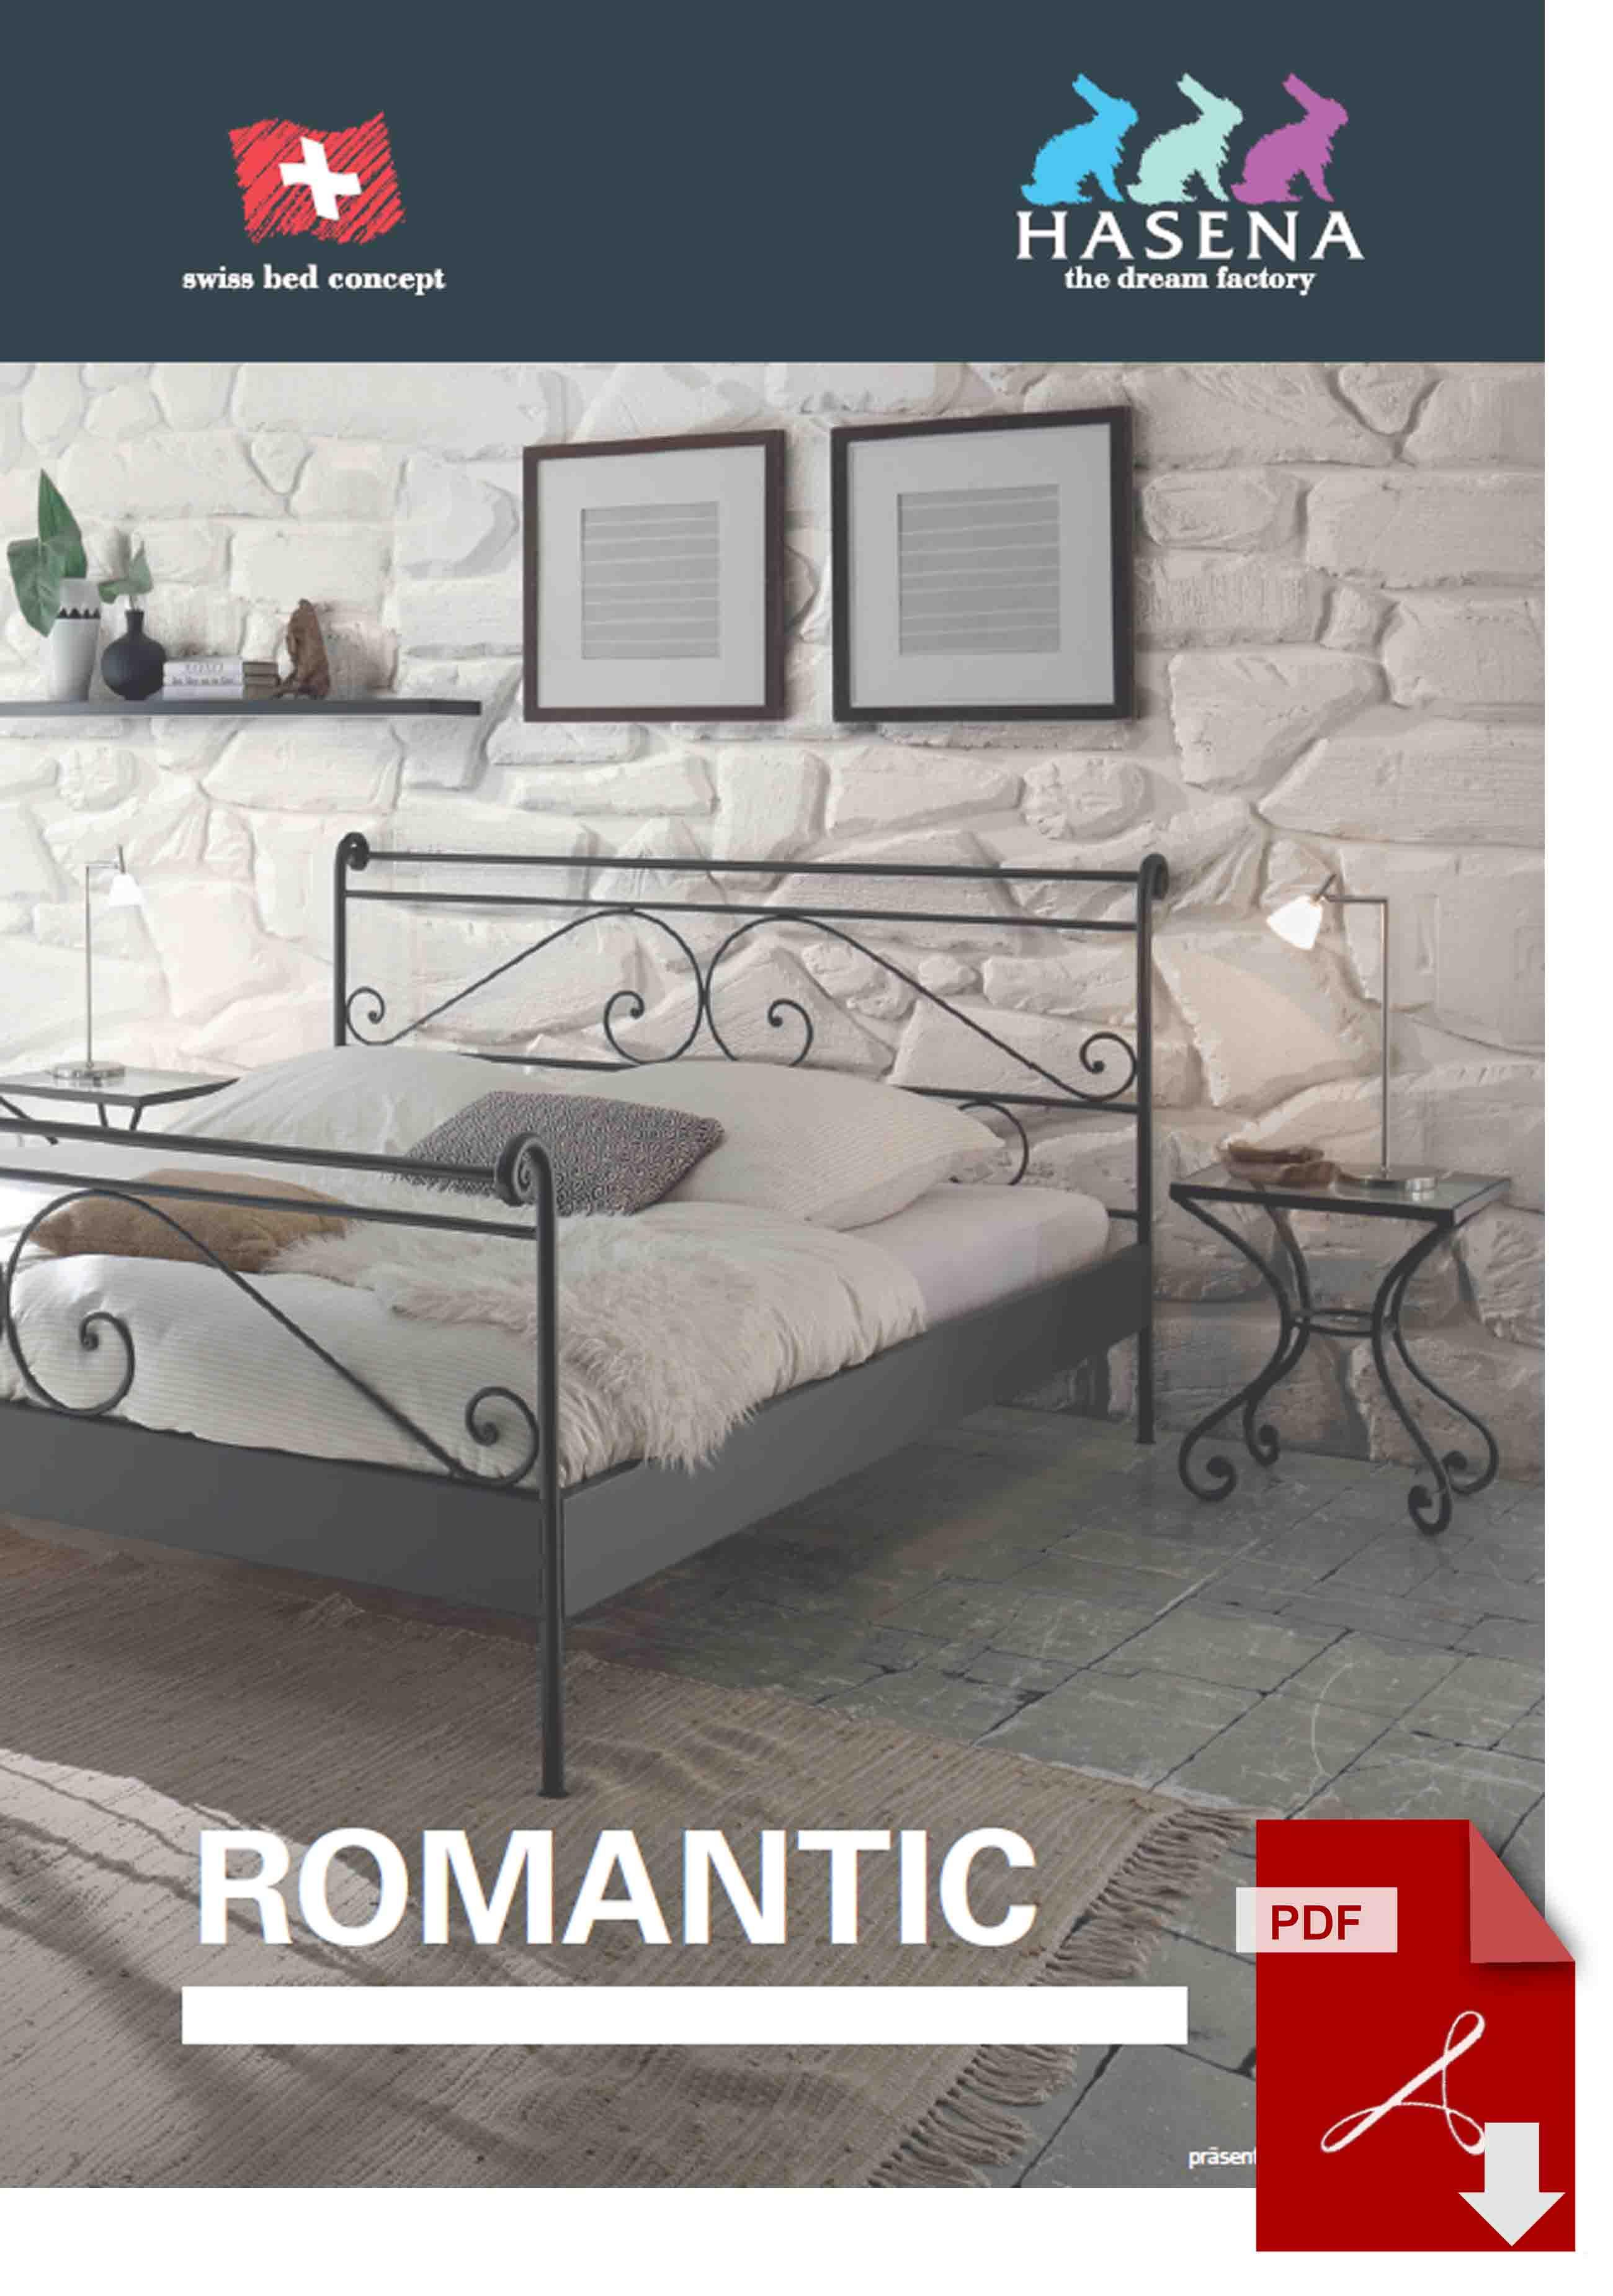 Hasena Romantic Katalog als PDF Datei